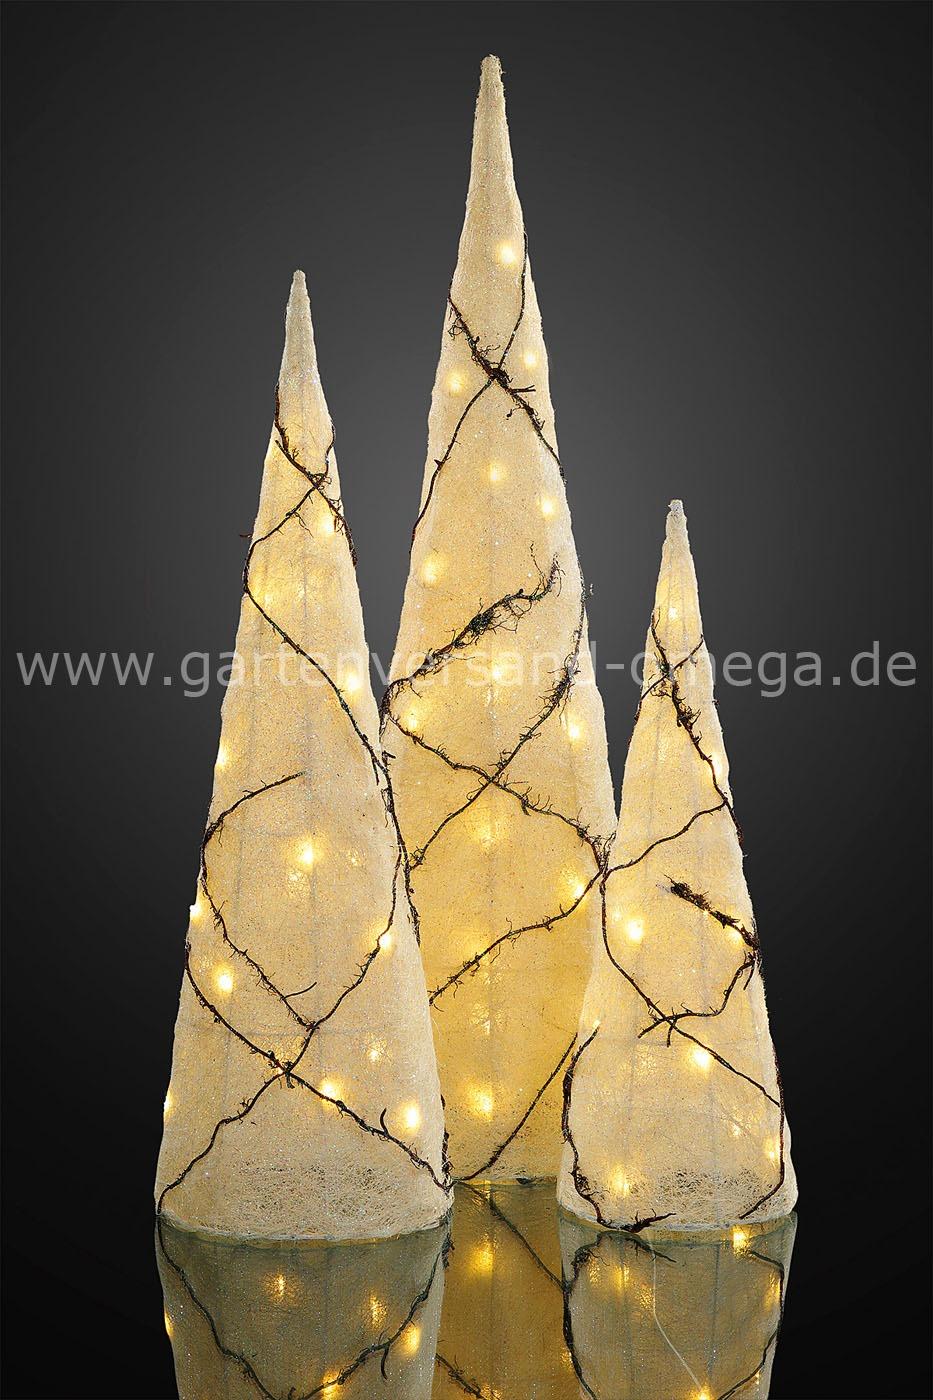 led pyramide weihnachten my blog. Black Bedroom Furniture Sets. Home Design Ideas